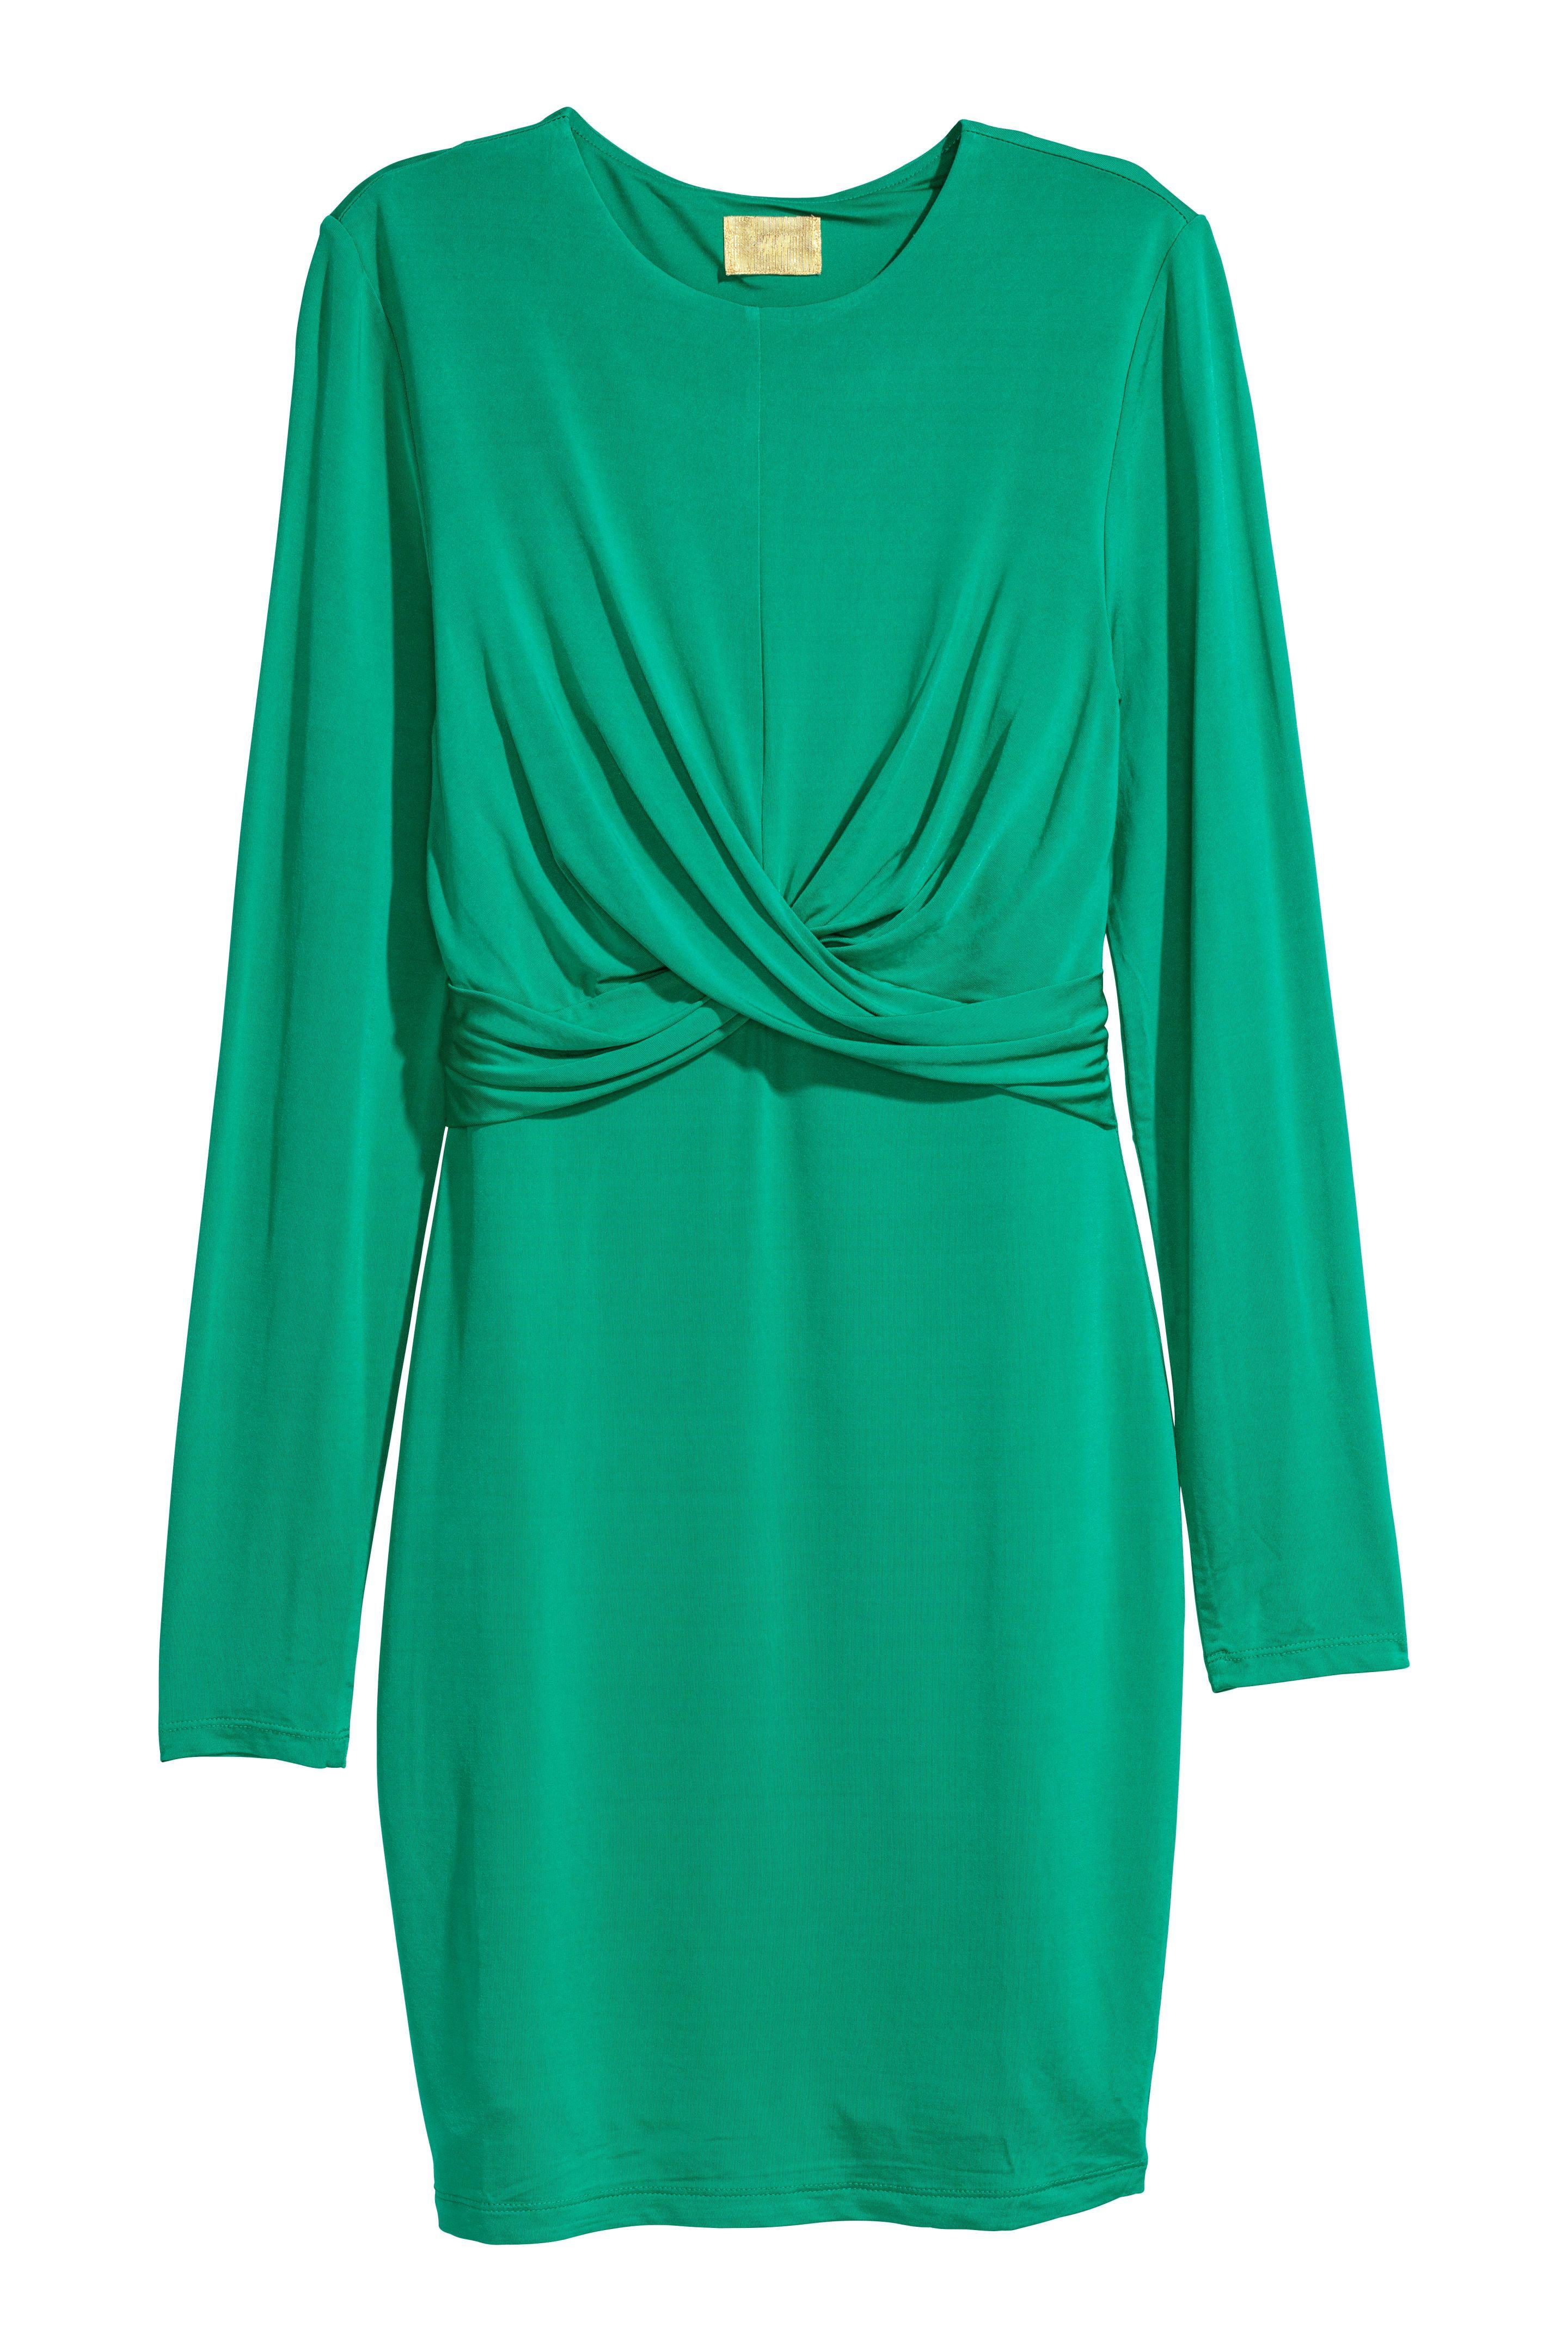 4018d47d6261 Draped jersey dress | NEWEST | Green dress, Draped dress, Dresses